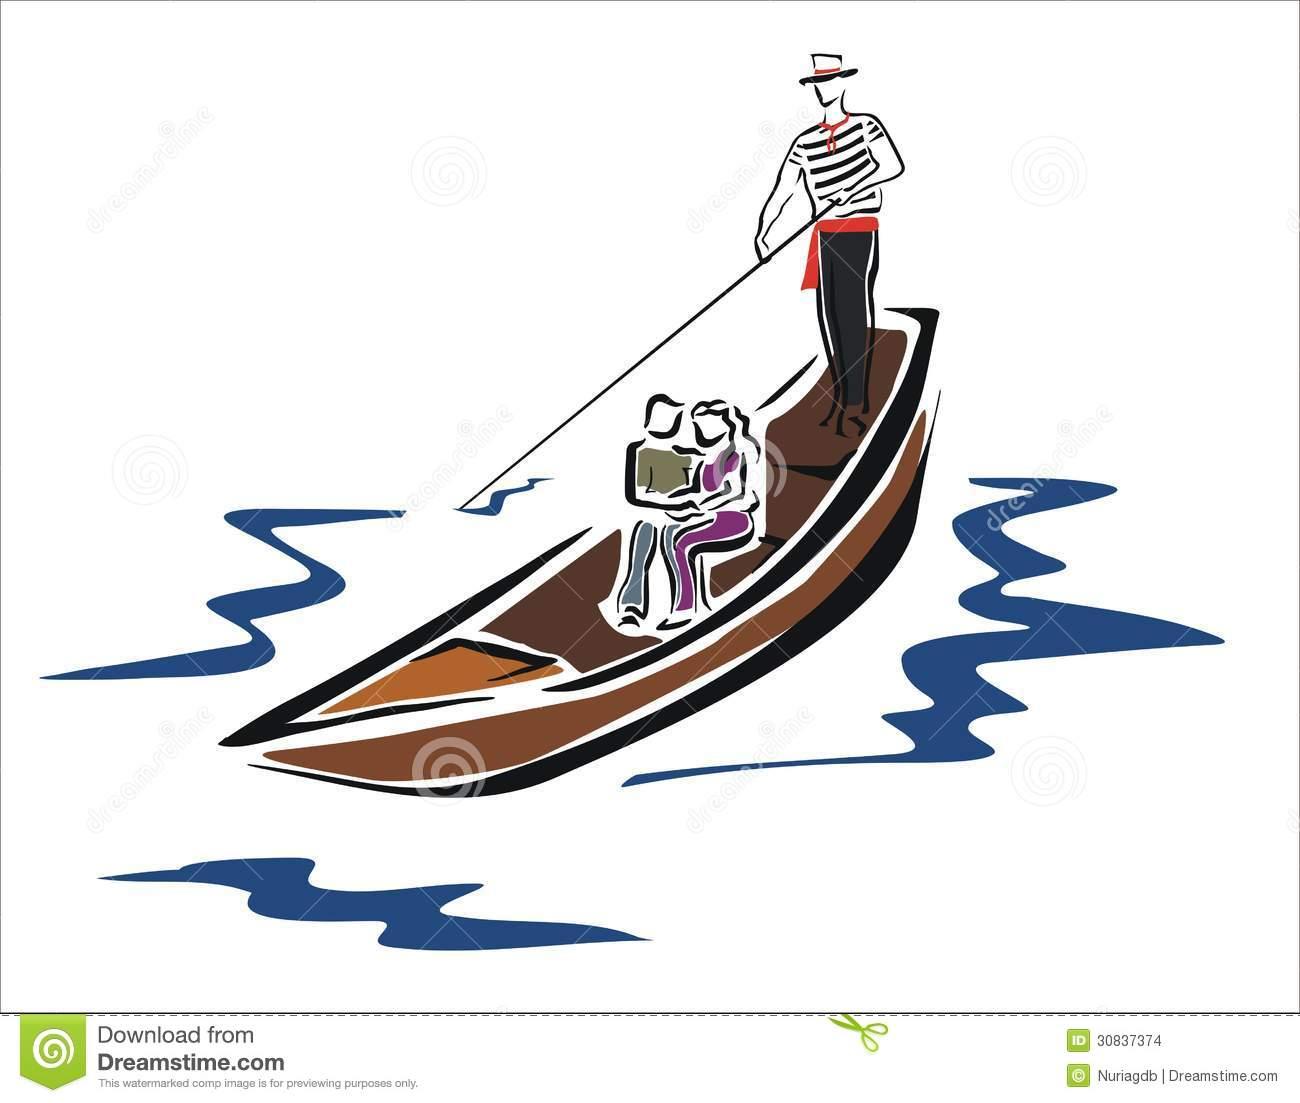 gondola clipart clipart panda free clipart images rh clipartpanda com italy gondola clipart gondola clipart free